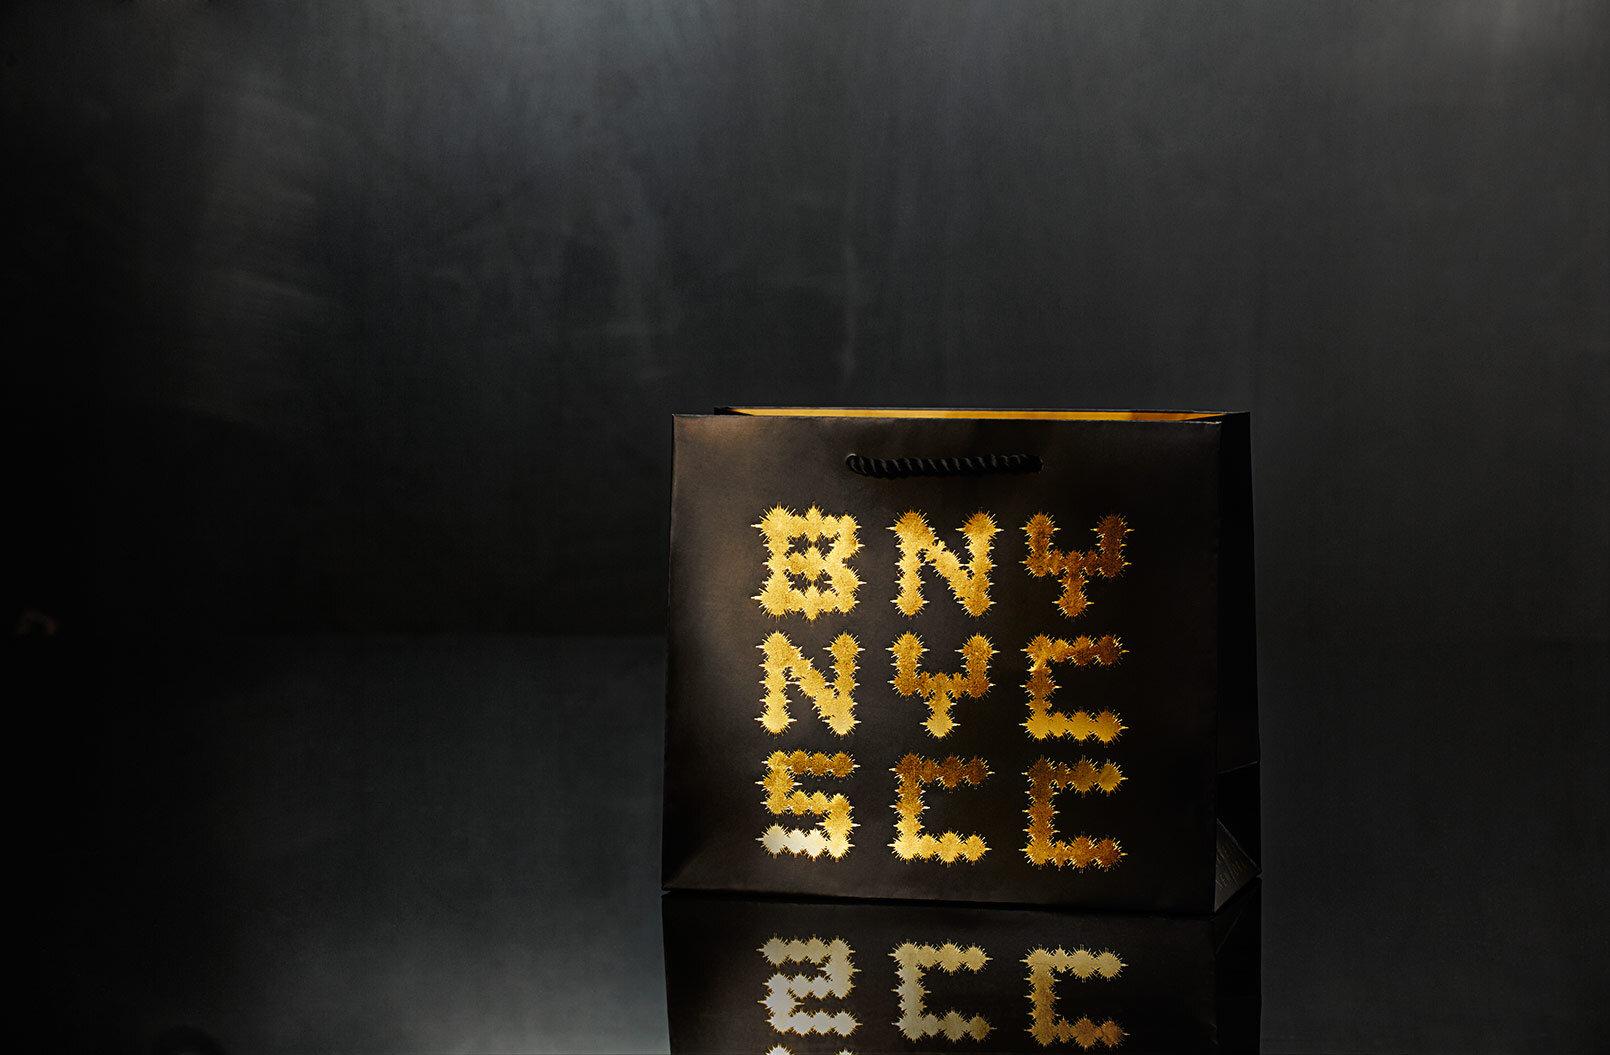 Barneys-New-York-Holiday-Jayz-Design-Packaging-Company-1.jpg